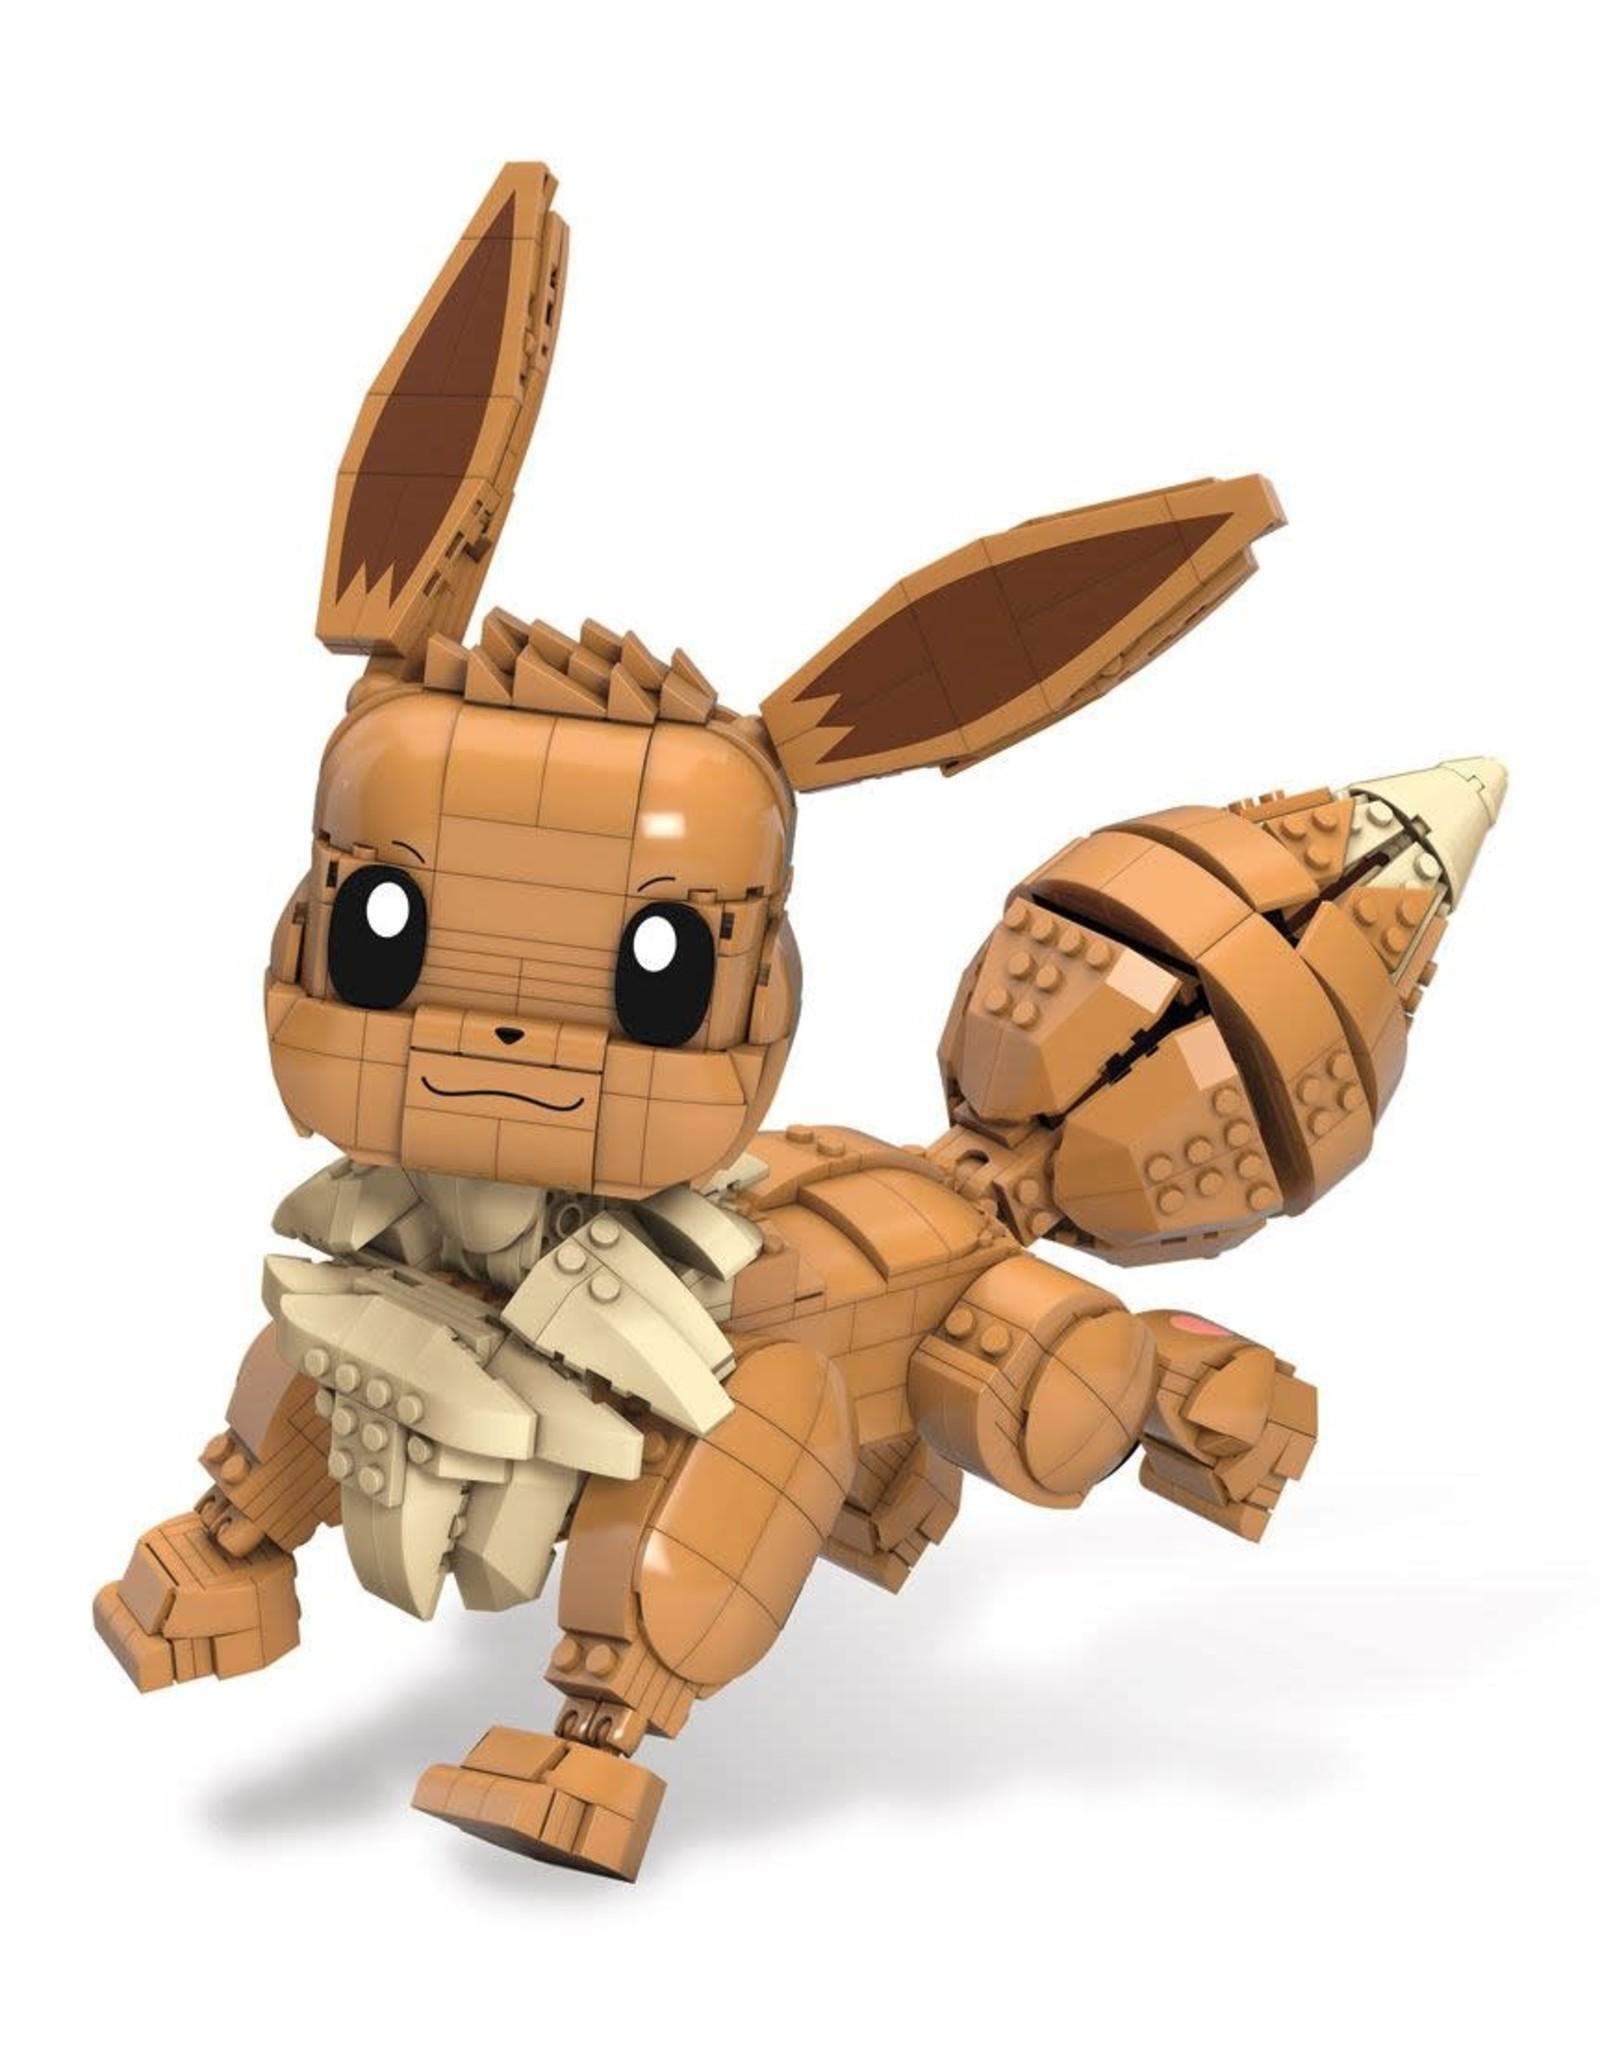 Pokémon - Jumbo Eevee - Mega Construx Wonder Builders Construction Set - 33 cm